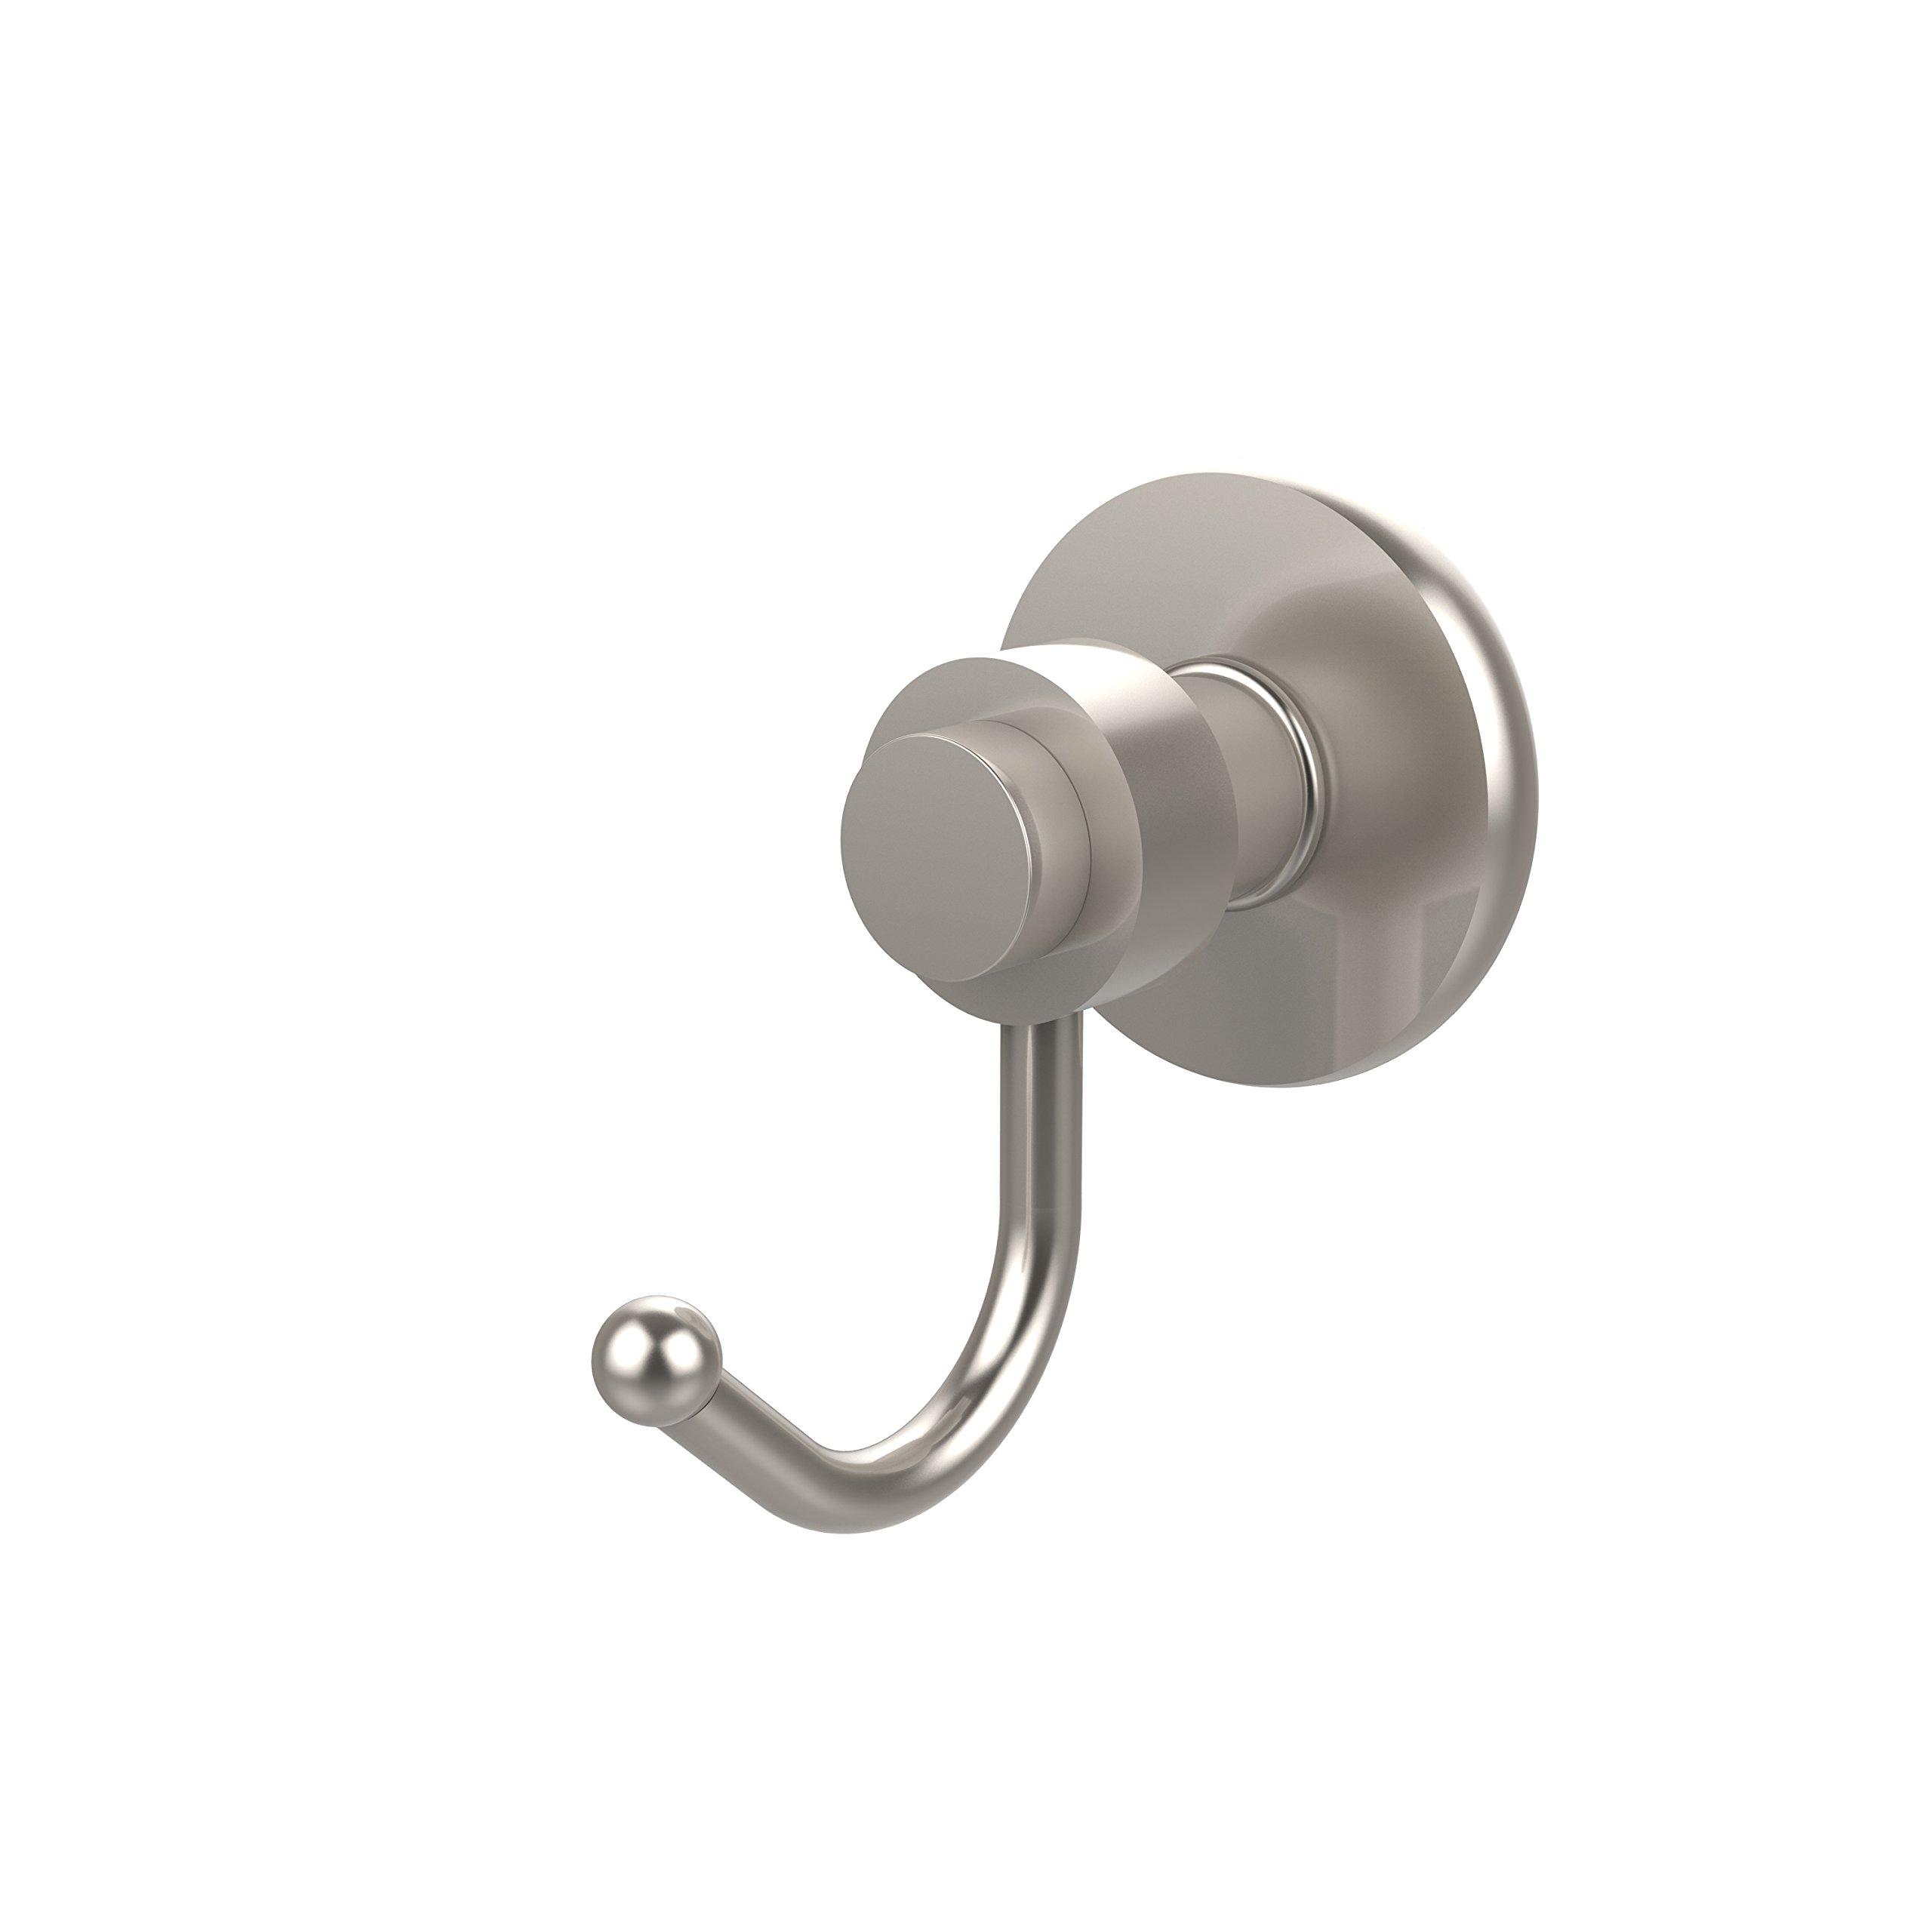 Allied Brass 920-SN Utility Hook, Satin Nickel